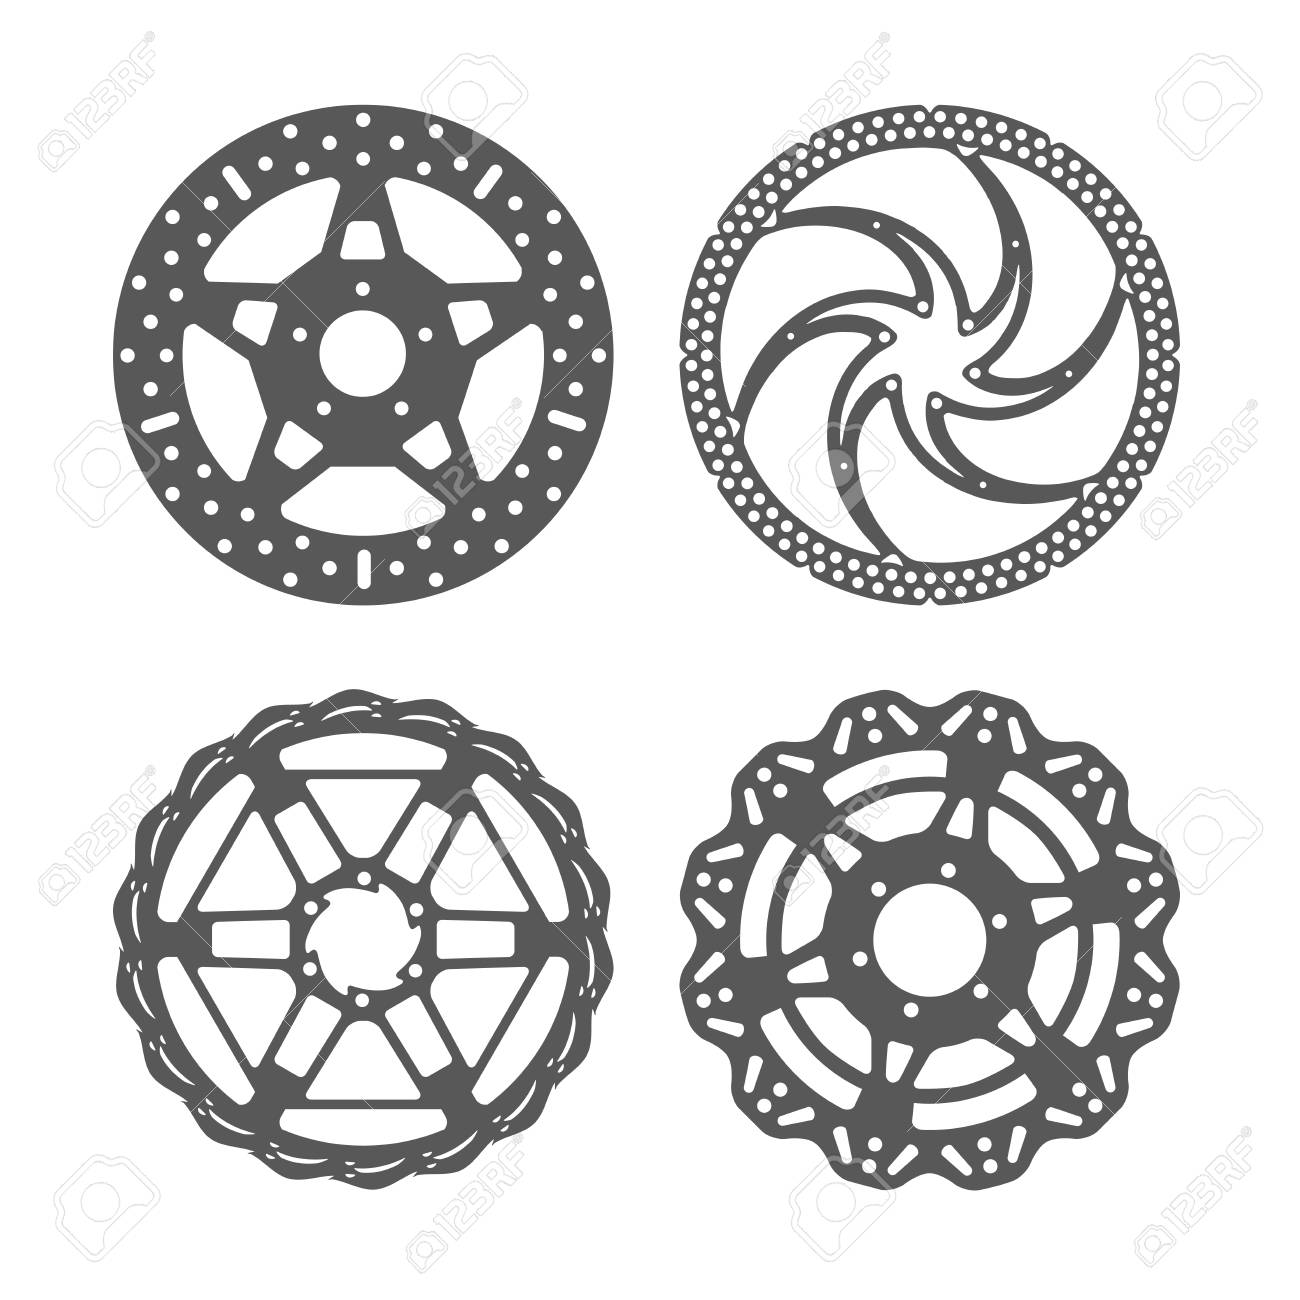 Bicycle Disc Brake Set Bike Disc Brake Rotors Of Different Shapes